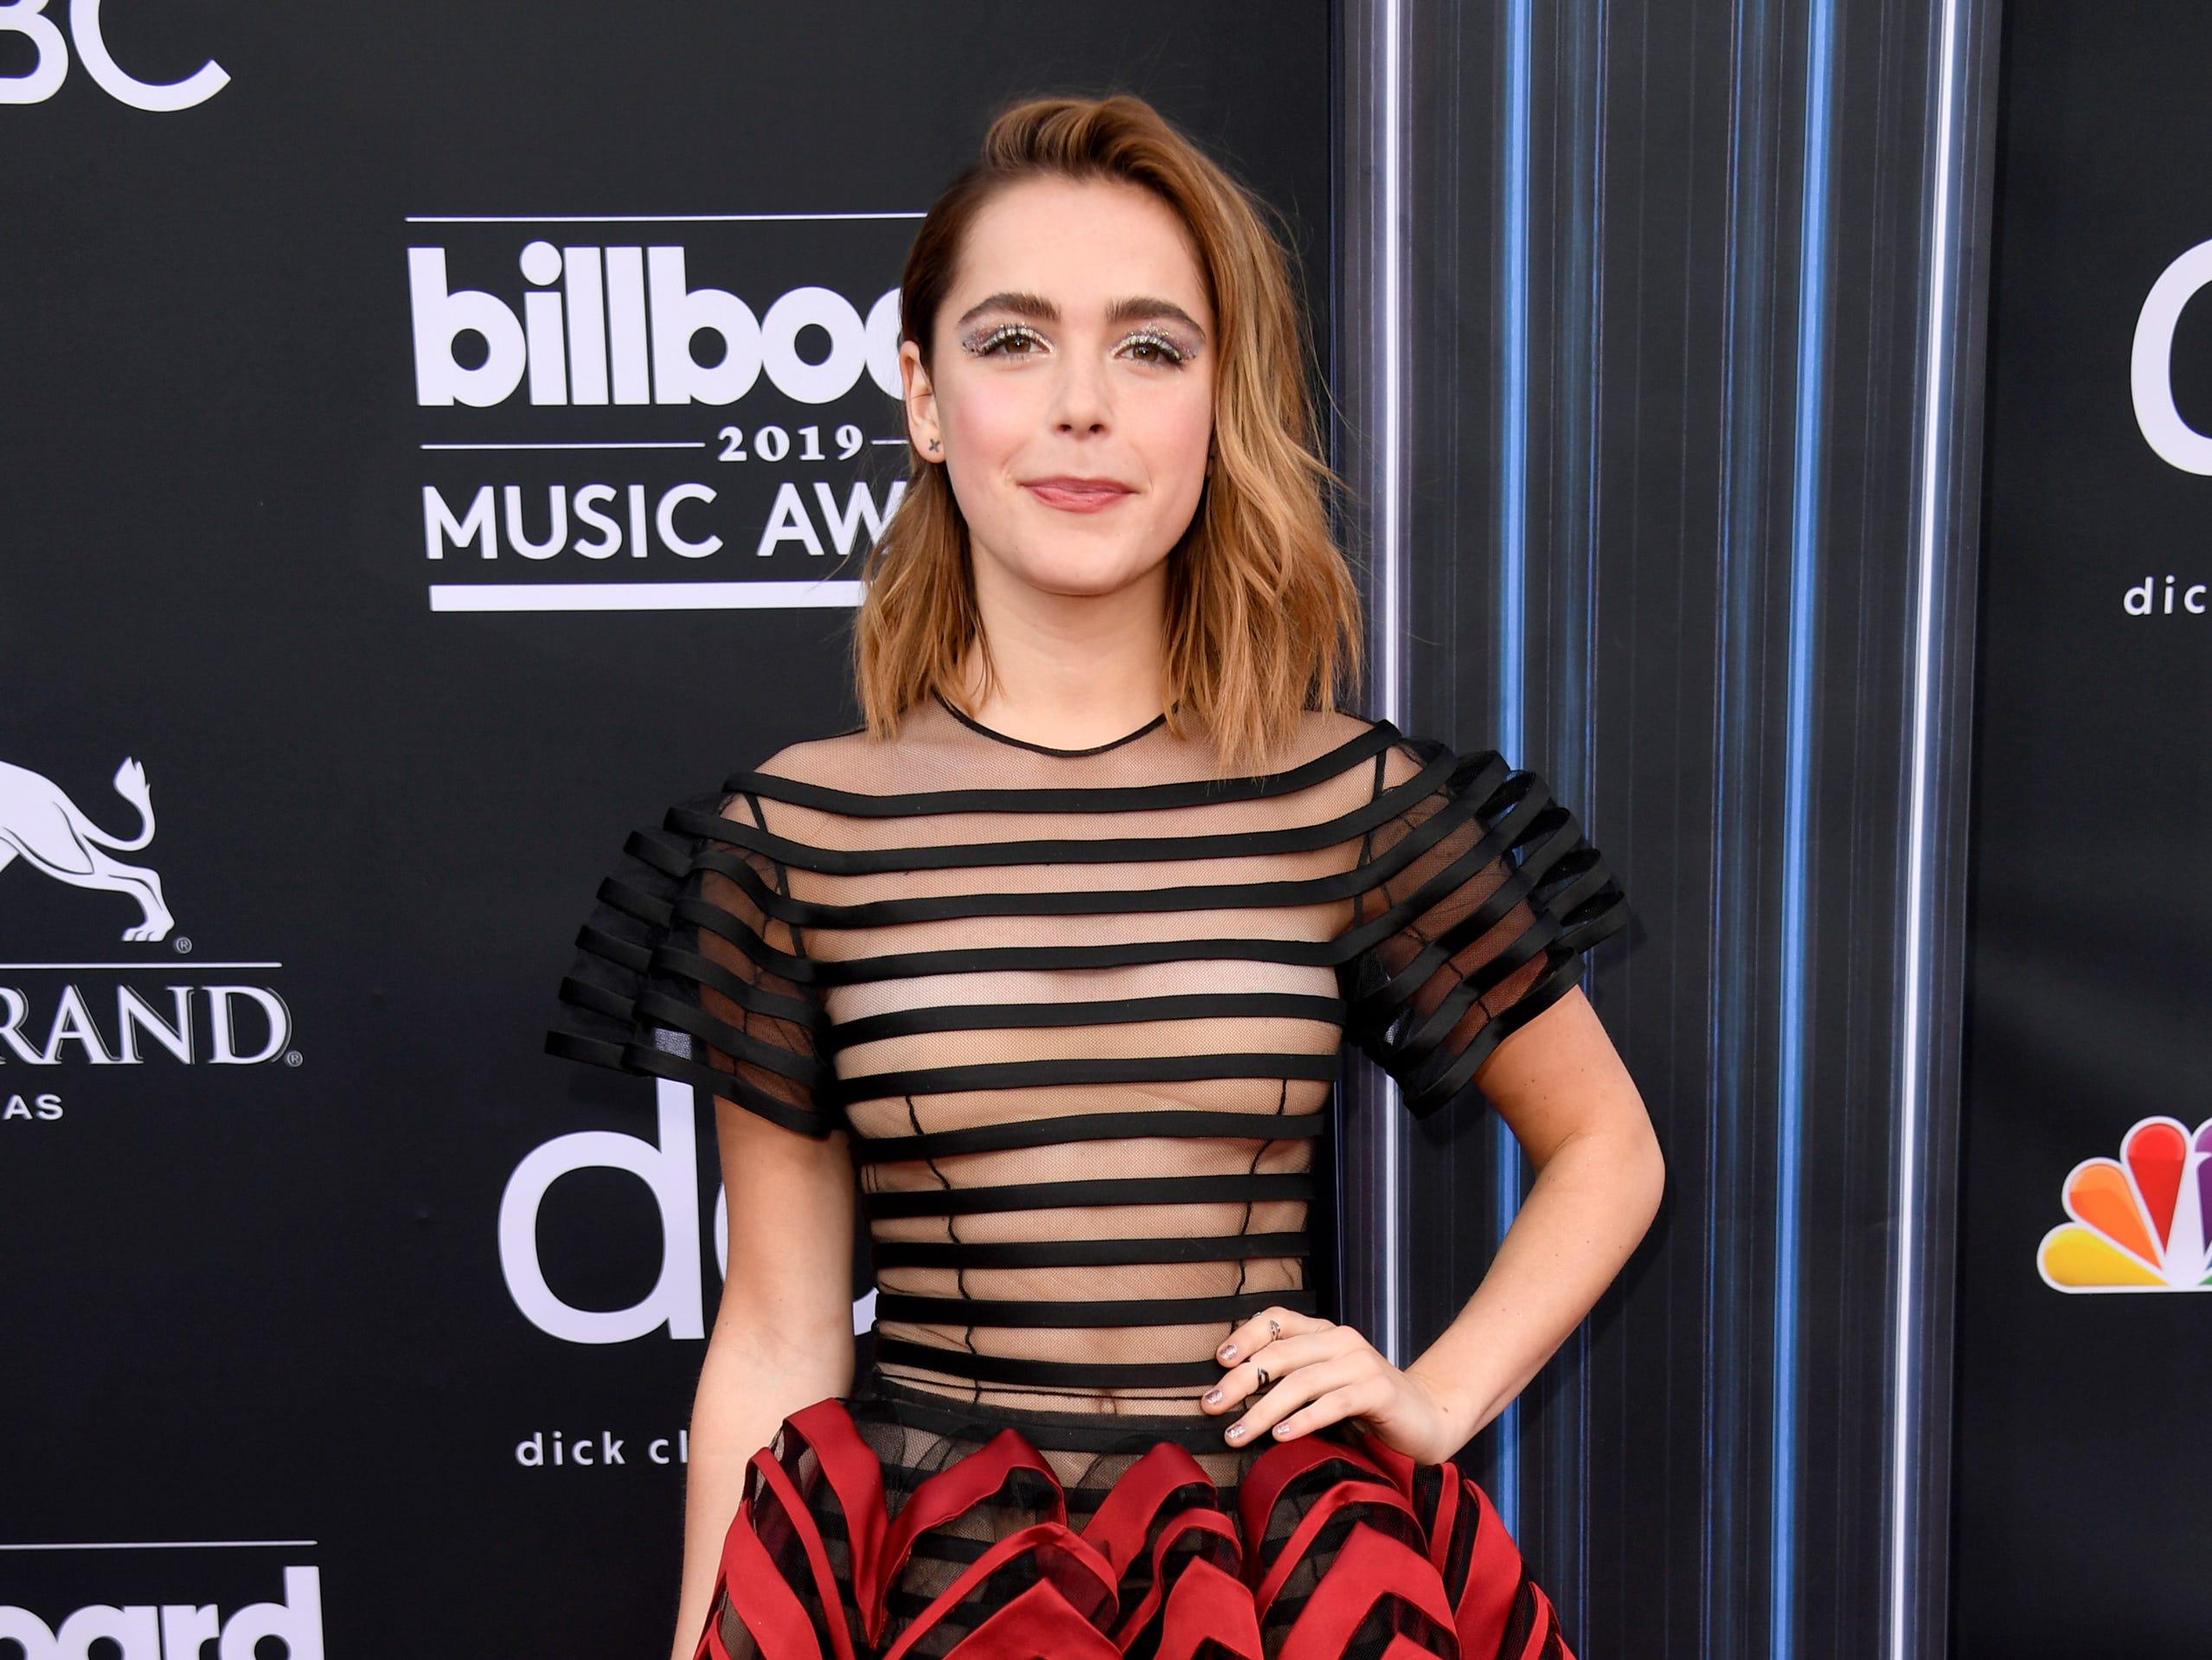 Kiernan Shipka attends the 2019 Billboard Music Awards at MGM Grand Garden Arena on May 01, 2019 in Las Vegas, Nevada.